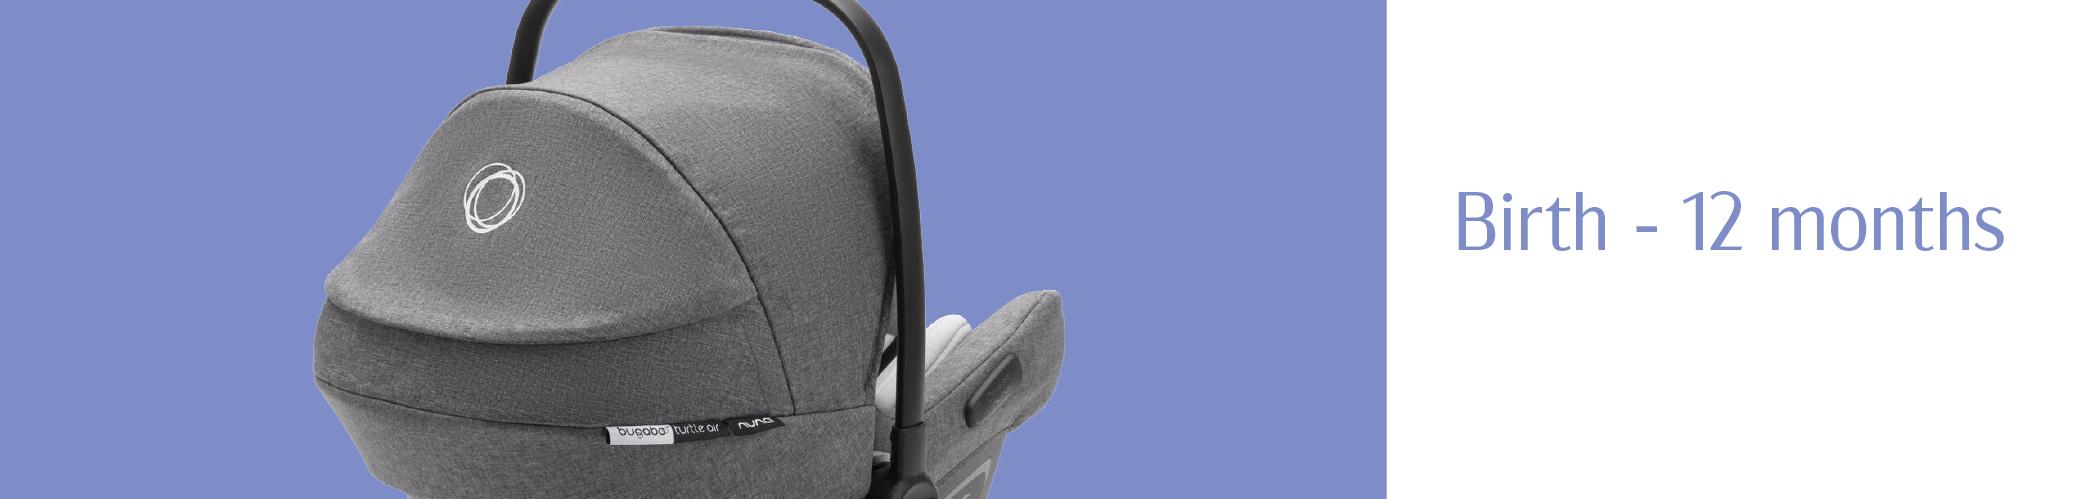 newborn baby in the new maxi cosi coral car seat